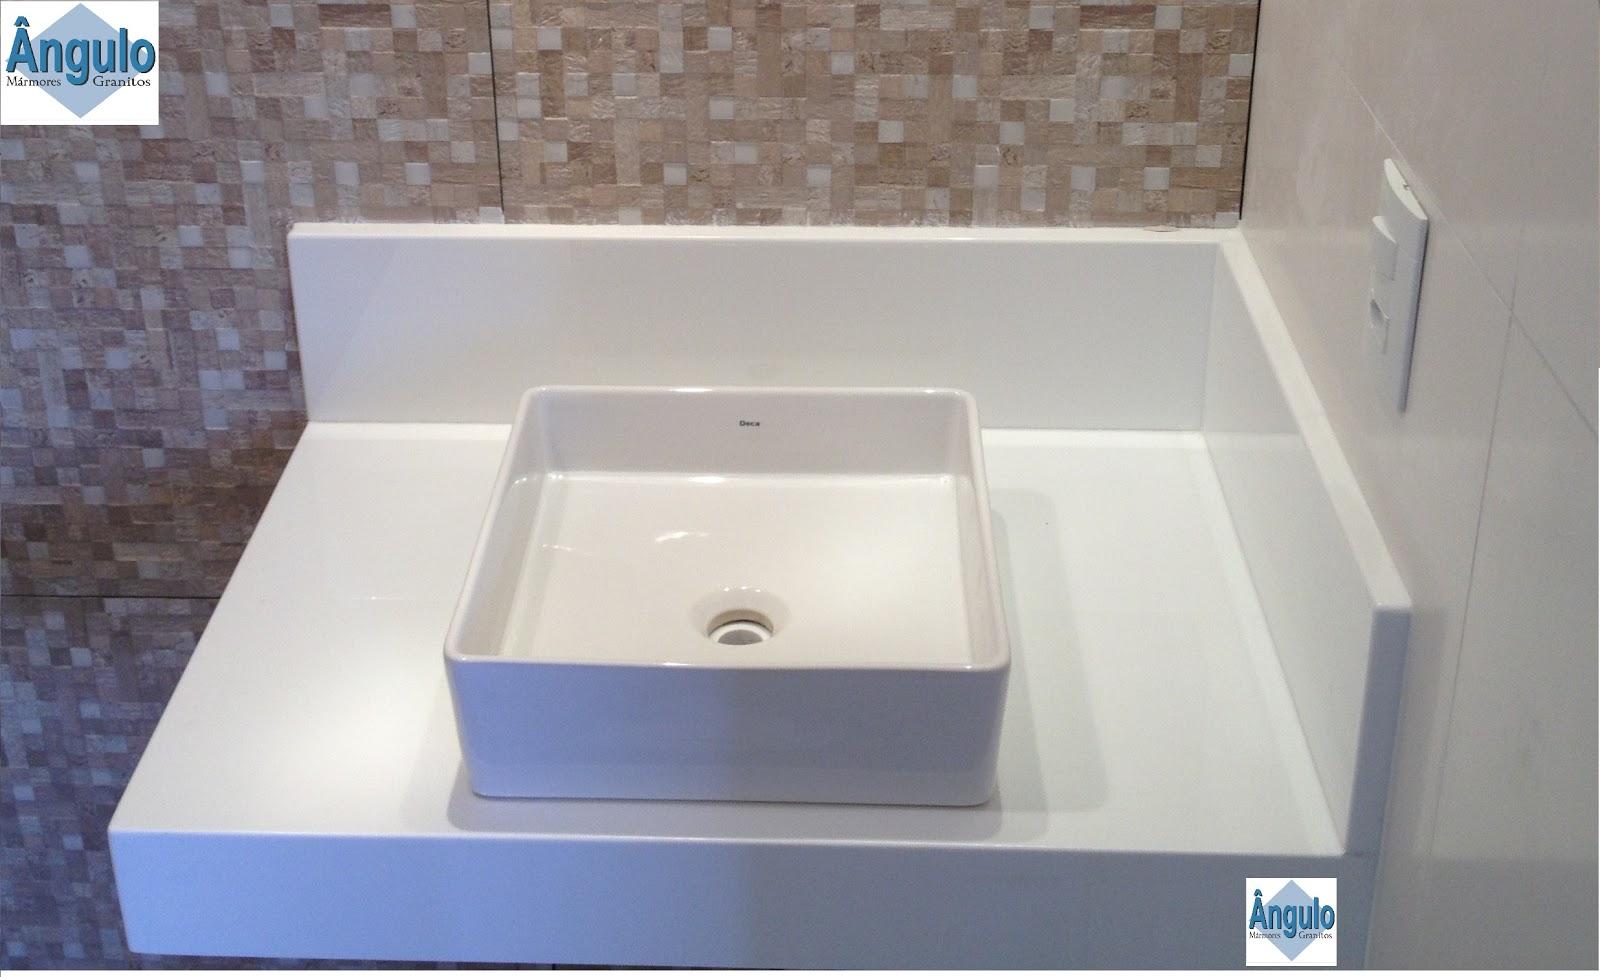 Ângulo Mármores e Granitos Cuba de Apoio  Bancada Nanoglass -> Cuba Para Banheiro Salvador Bahia